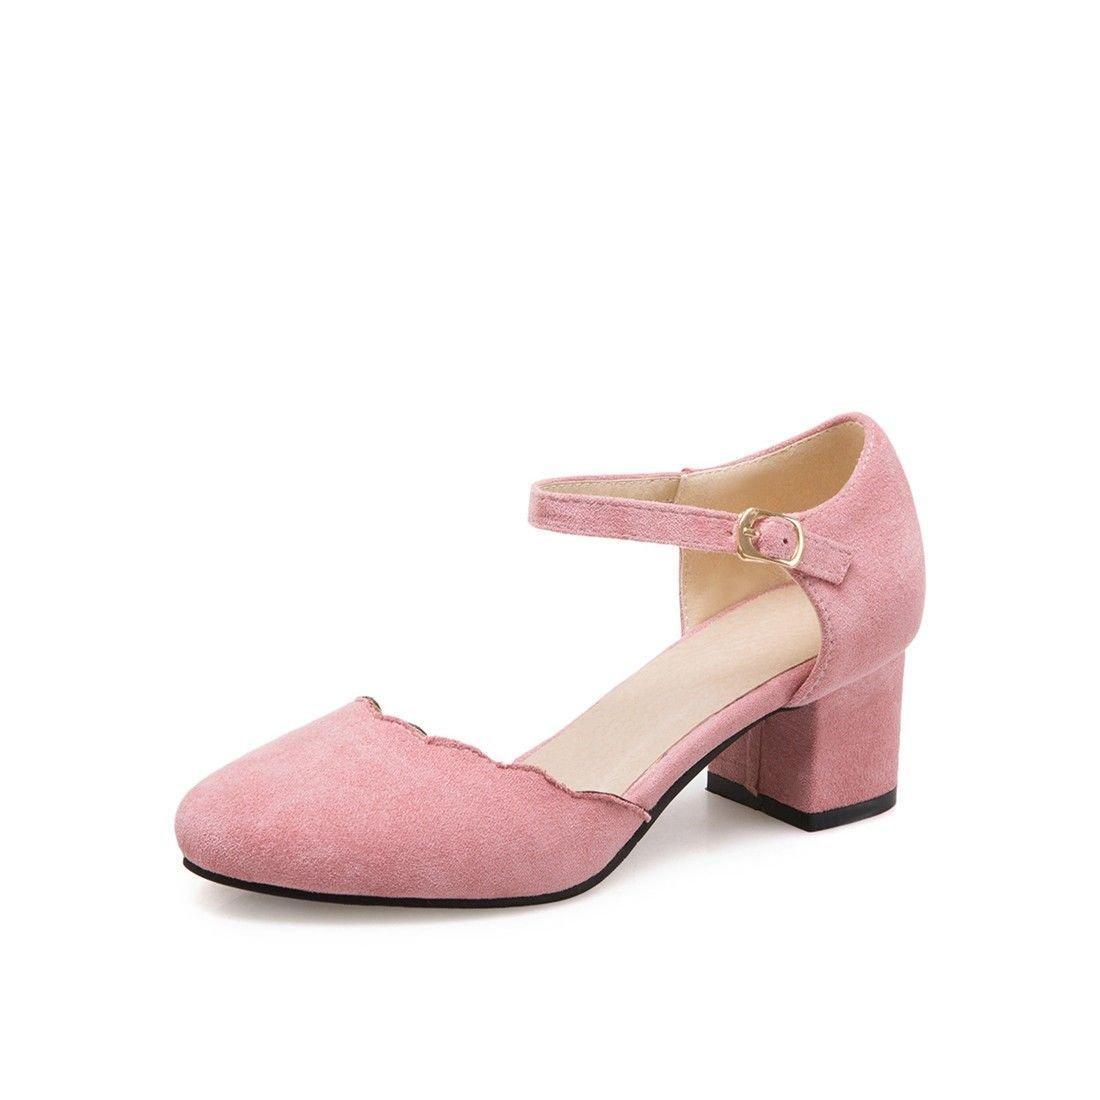 AIKAKA Damenschuhe Fruuml;hling Sommer Wildleder mit Sandalen  36 EU|Pink